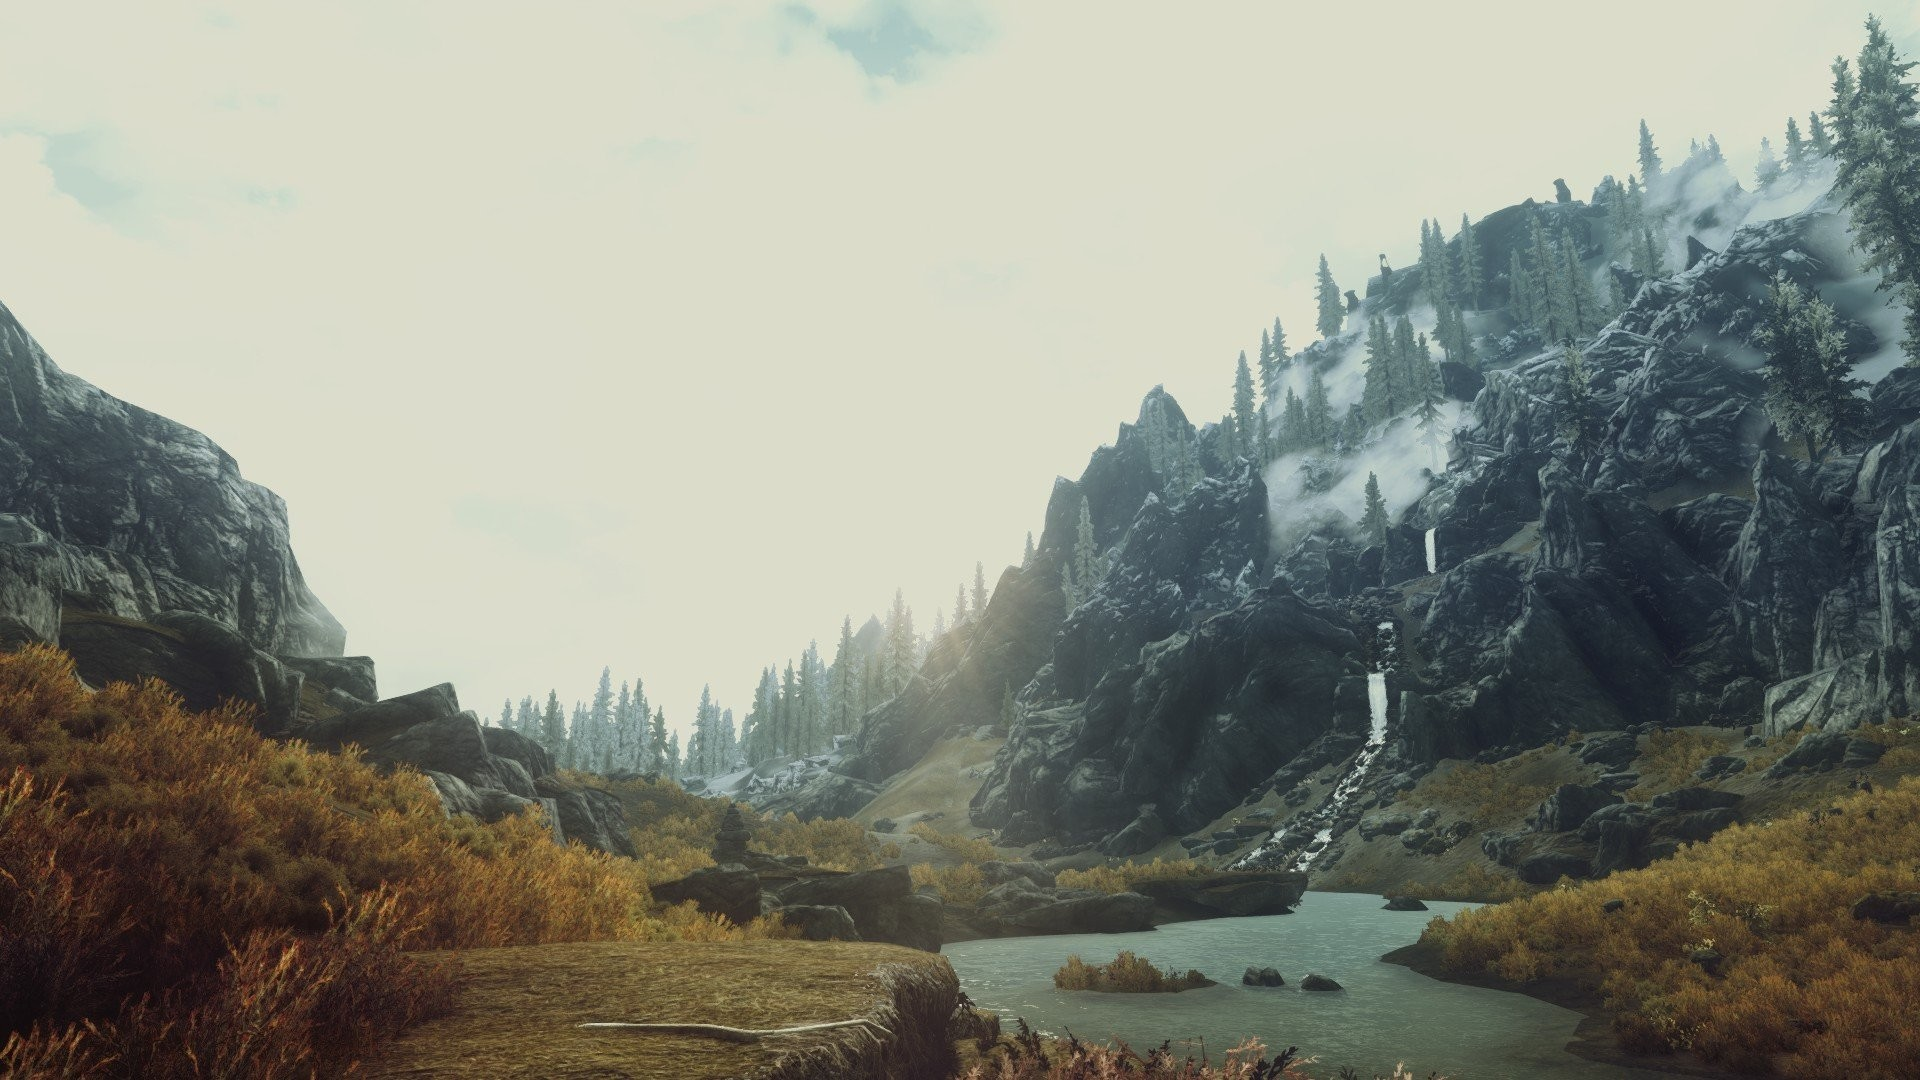 Video games nature screenshots The Elder Scrolls V: Skyrim wallpaper      244212   WallpaperUP